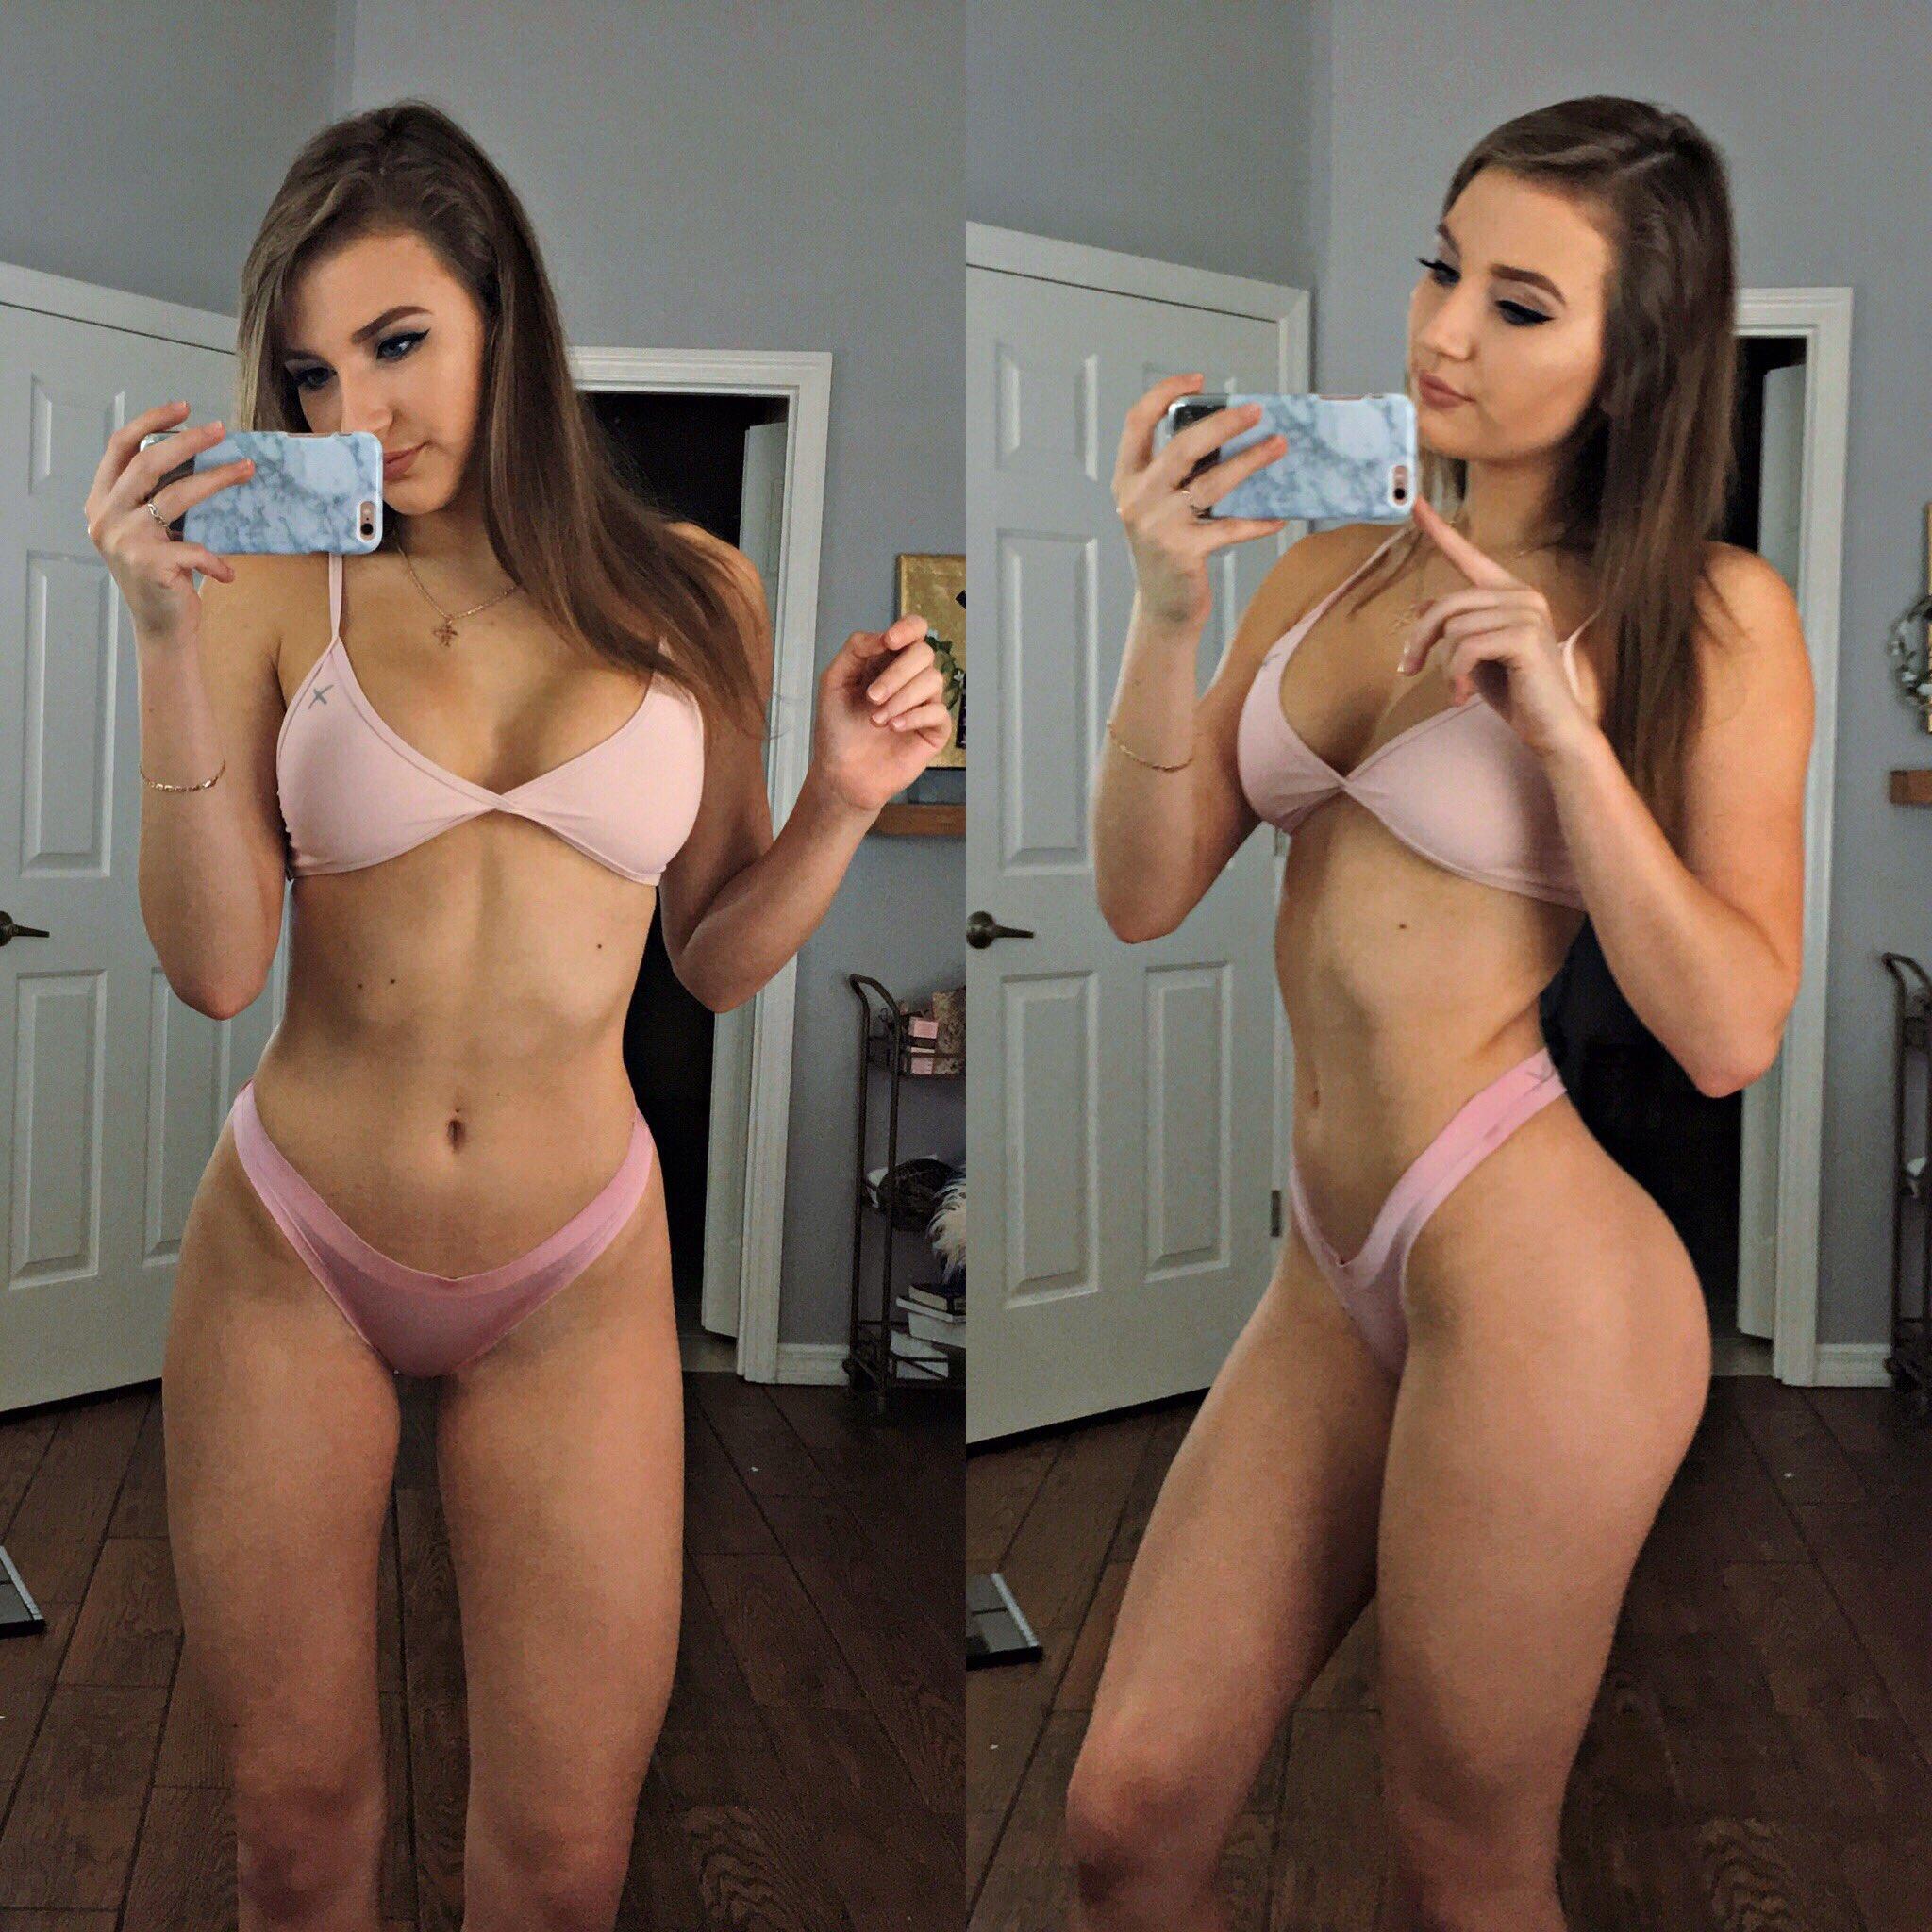 miss thailand porns images